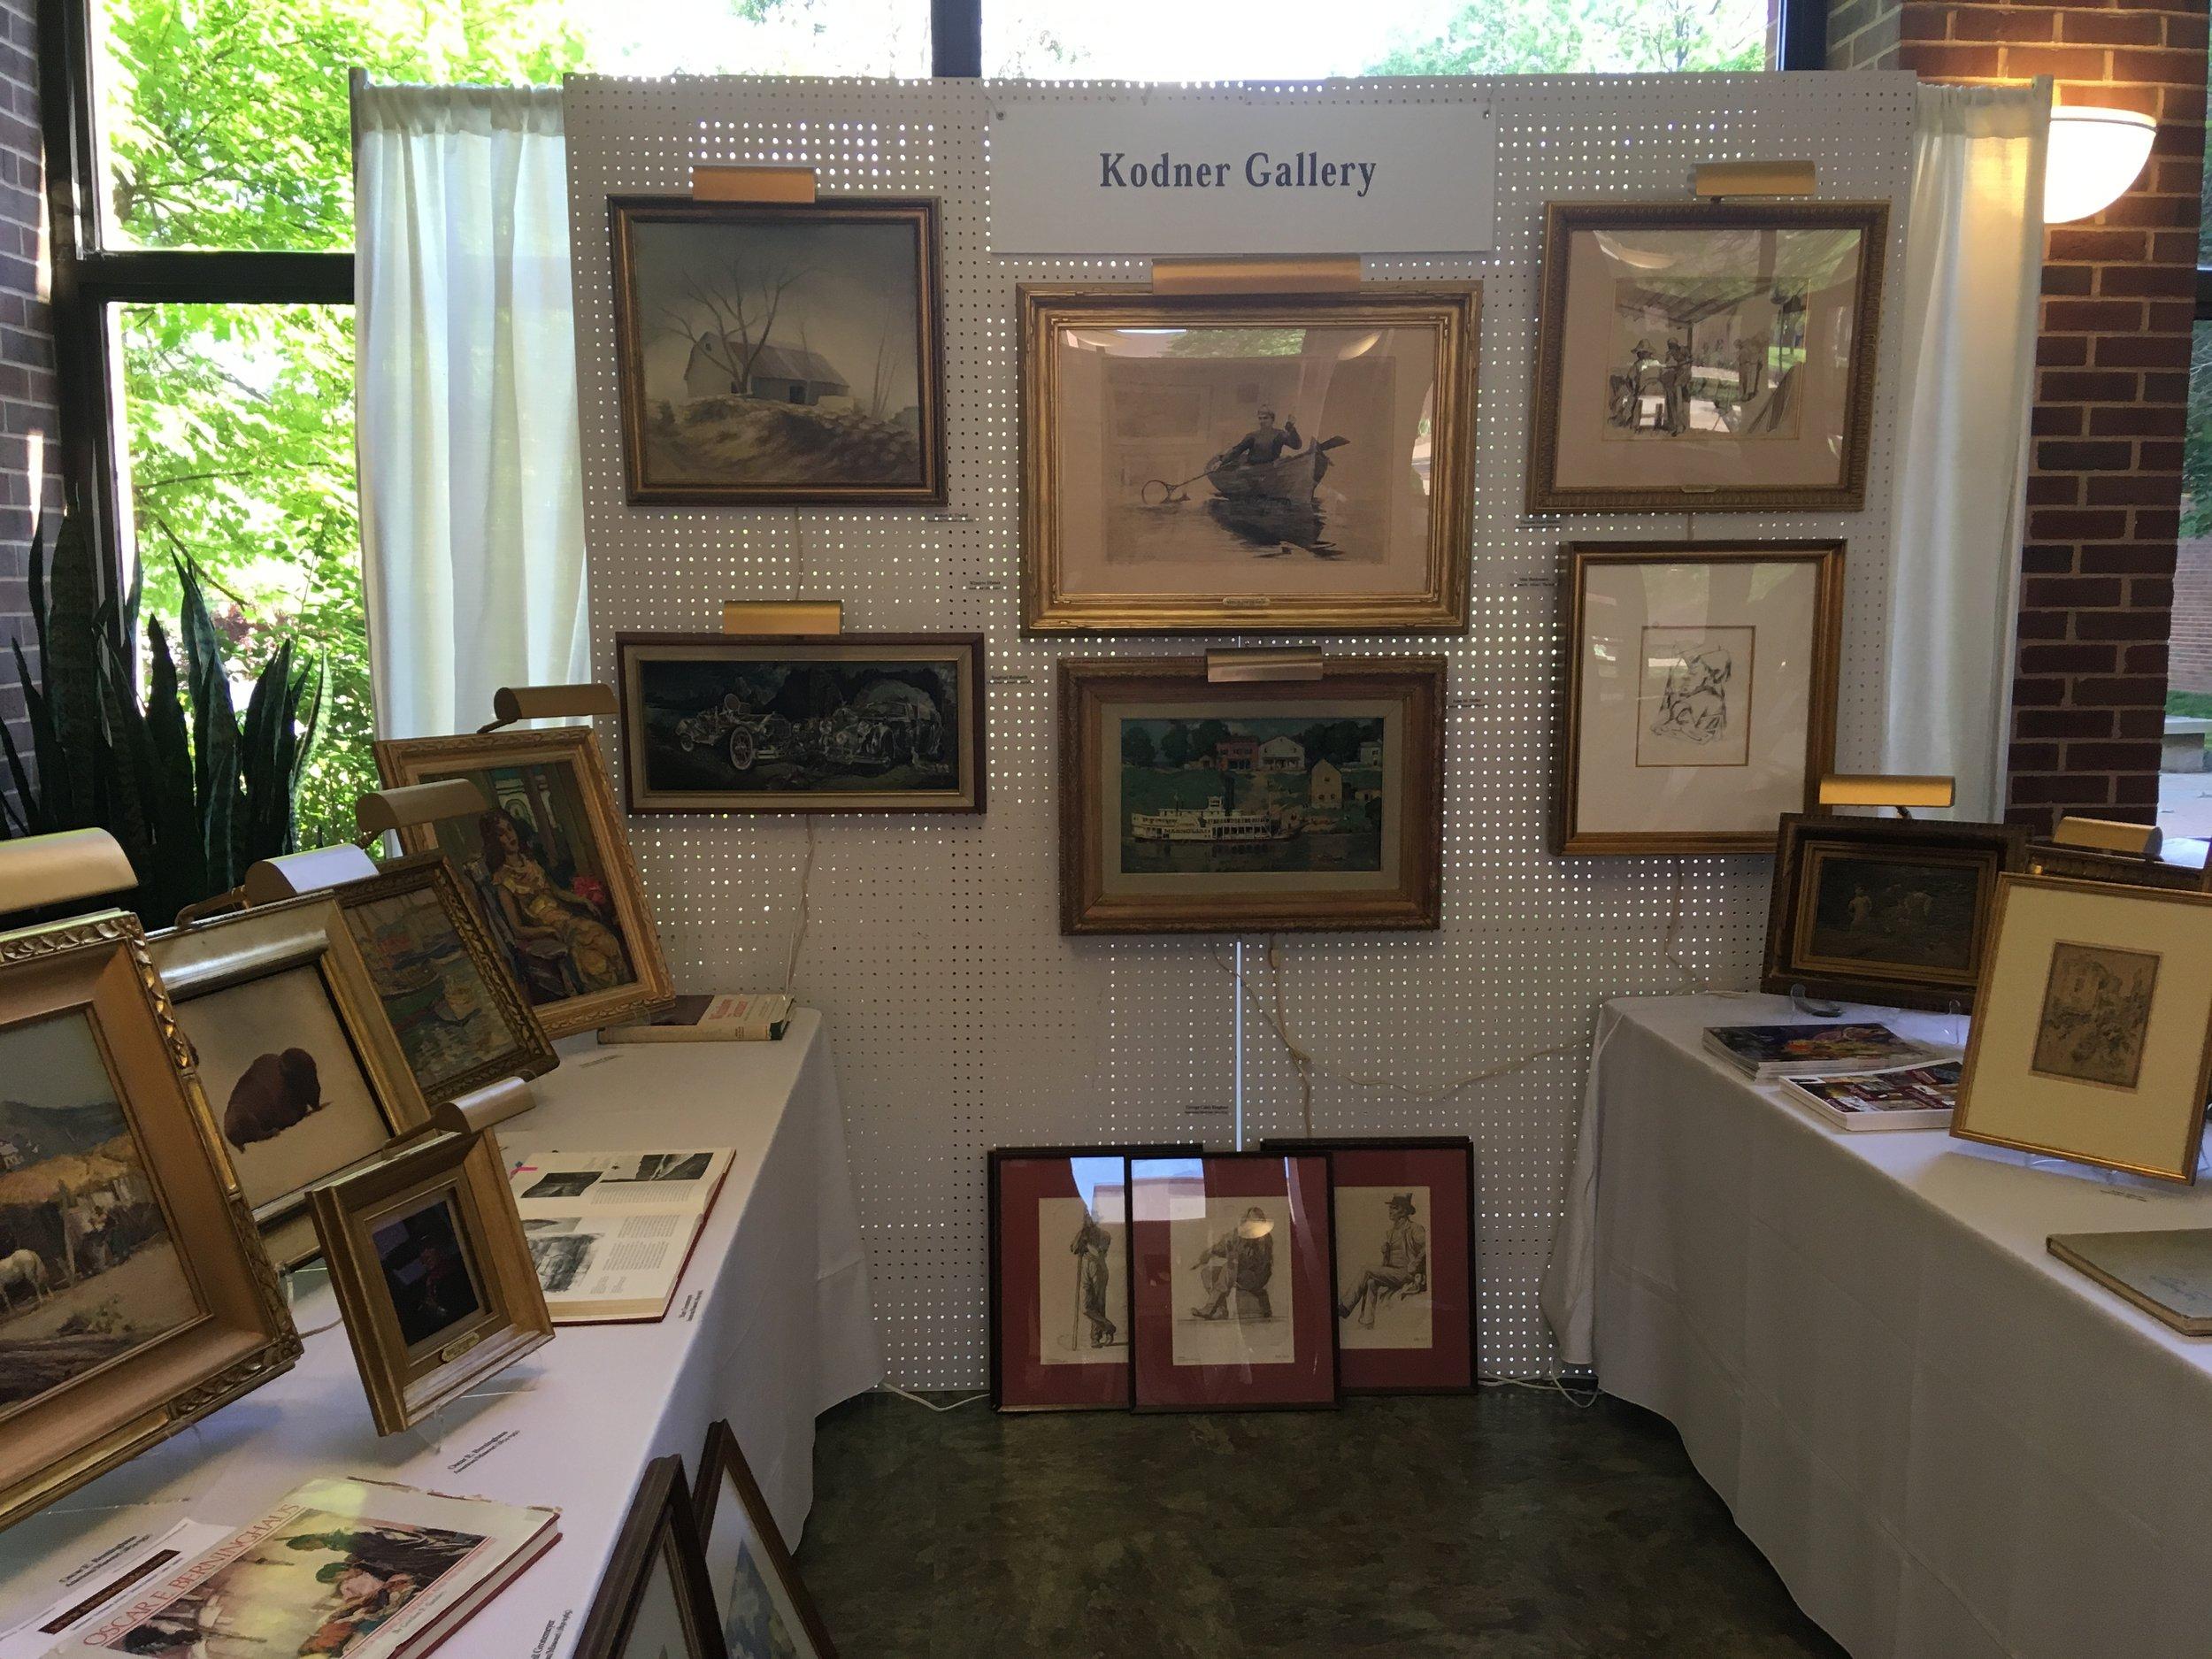 Kodner Gallery